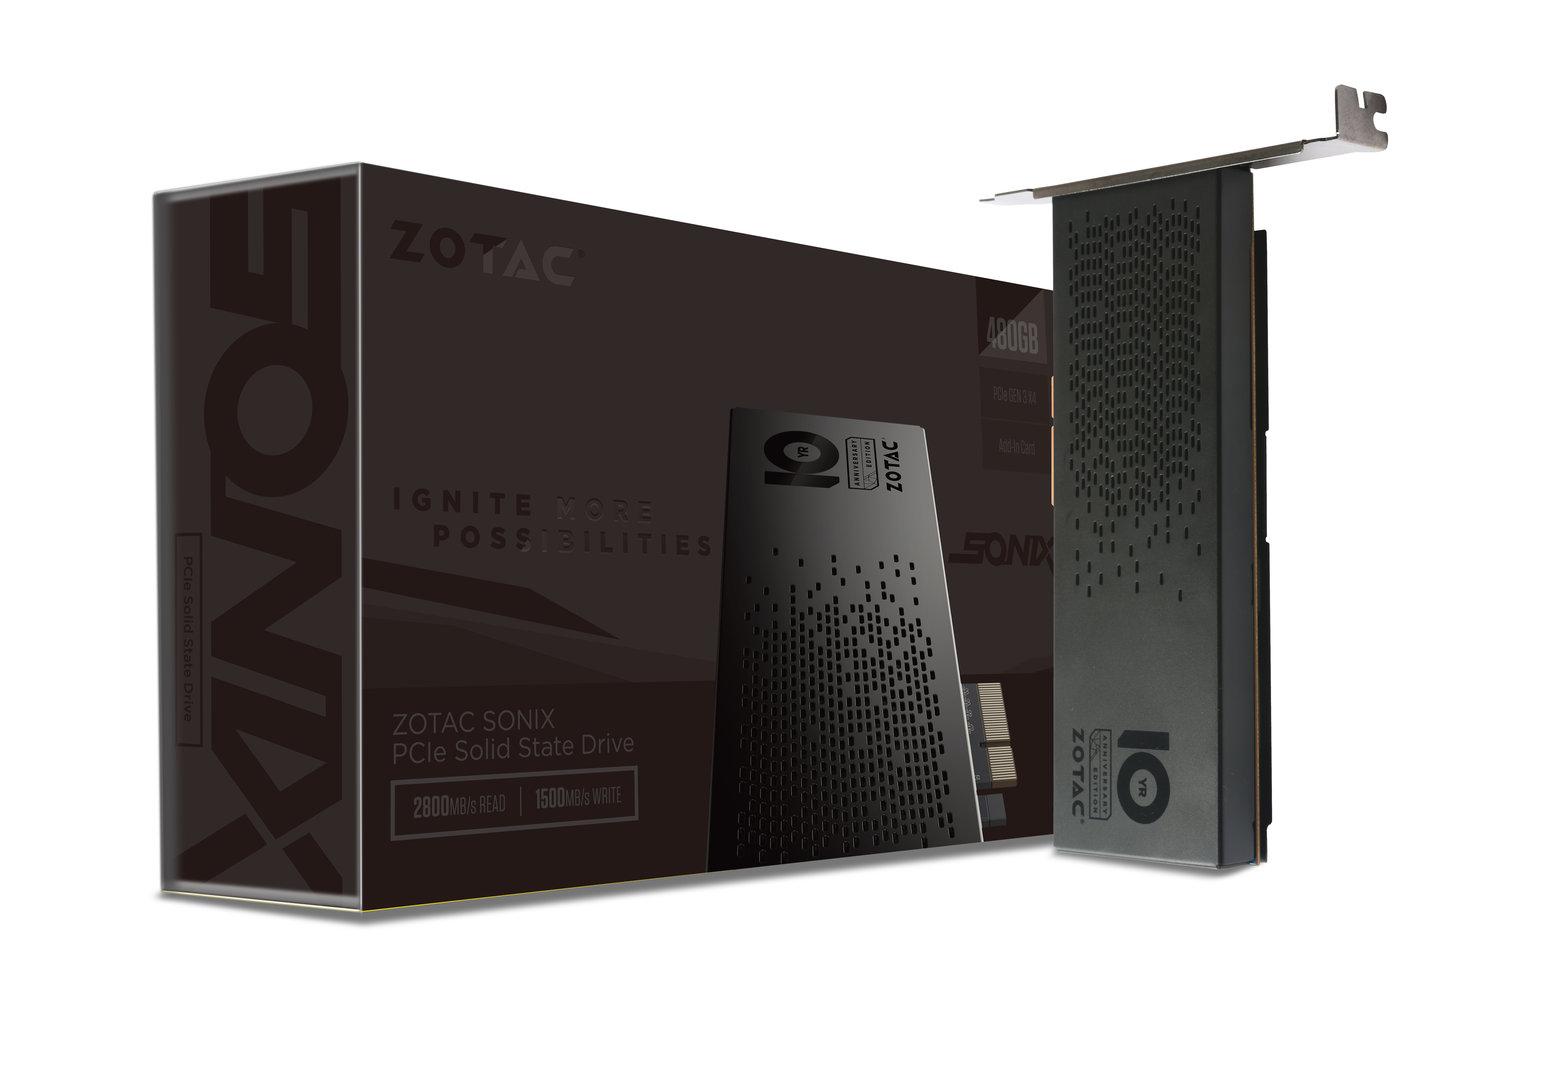 Zotac Sonix PCIe SSD Sonderedition